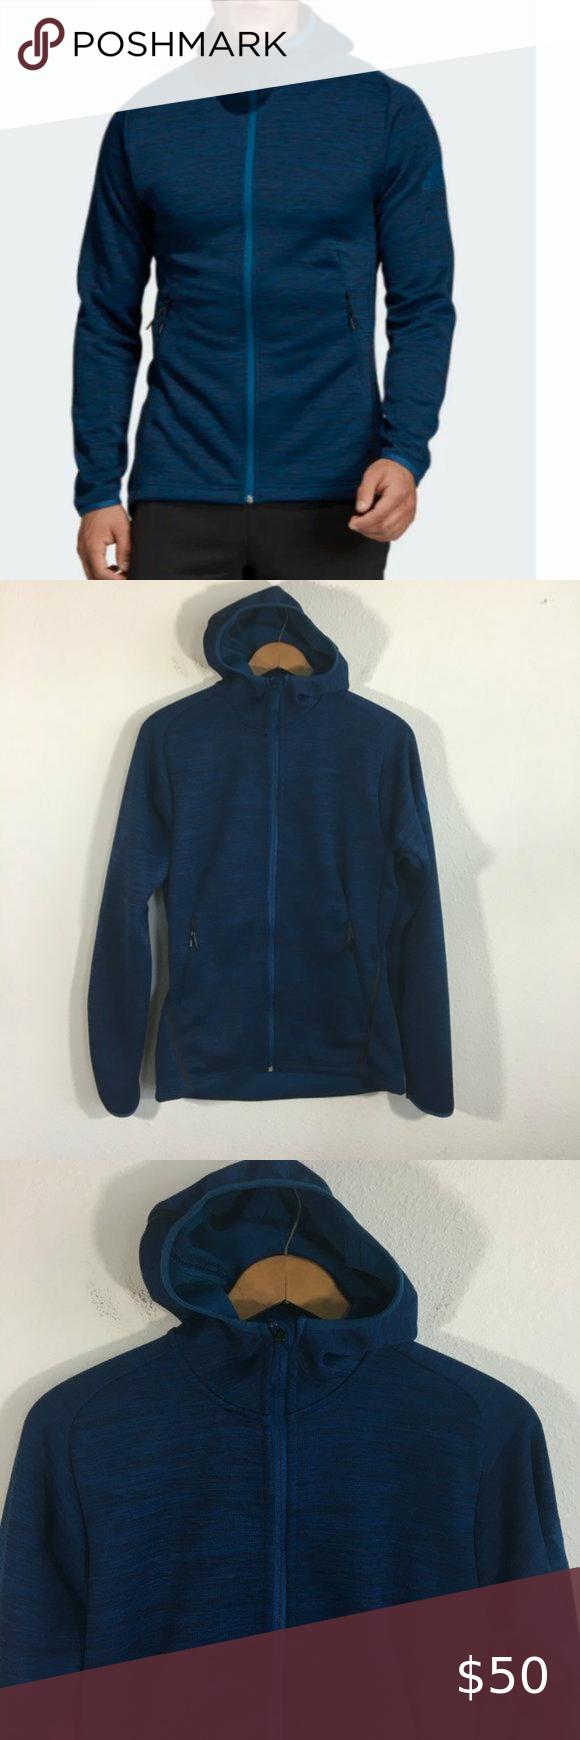 Predownload: Adidas Men S Freelift Climaheat Hoodie Jacket S Hoodie Jacket Fashion Vintage Adidas [ 1740 x 580 Pixel ]